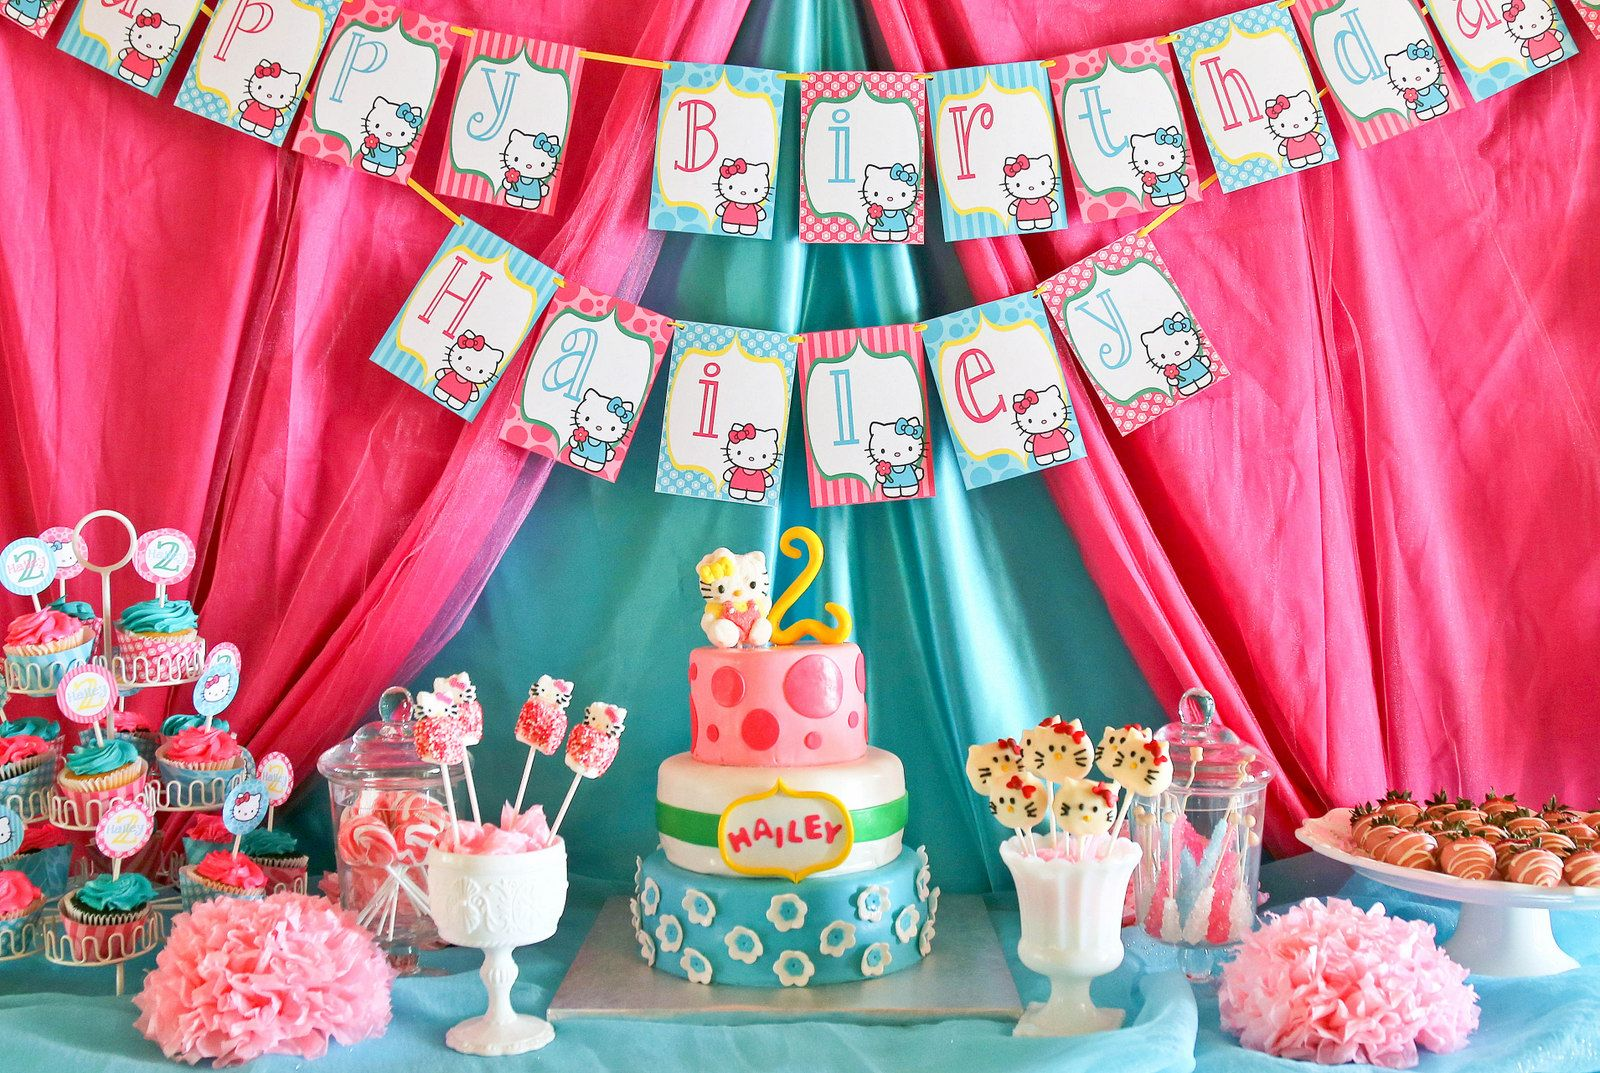 hello kitty birthday party ideas   Hello Kitty Party: Hailey's Hello Kitty Birthday